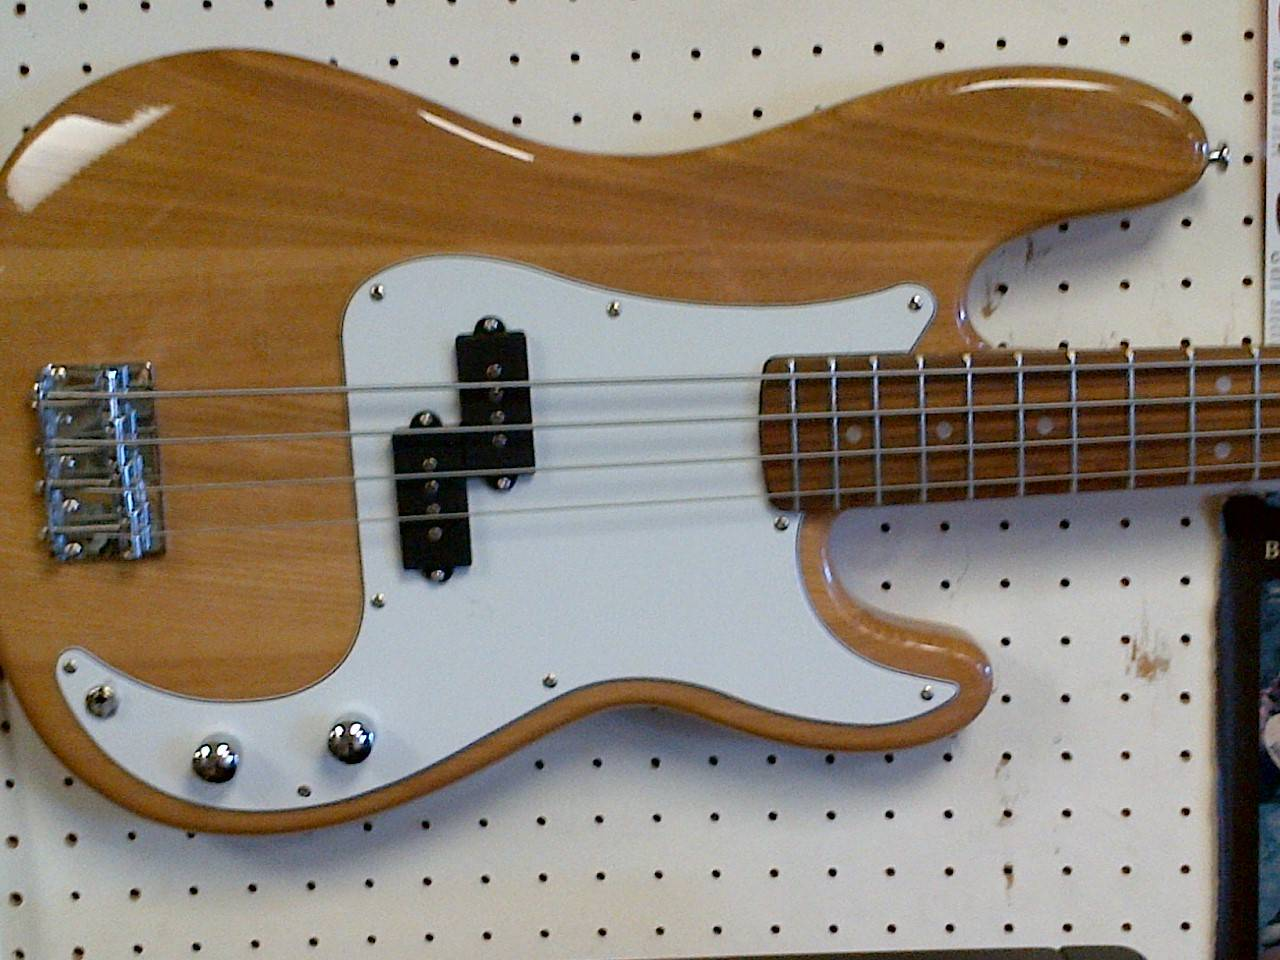 Mansfield 4 string bass guitar